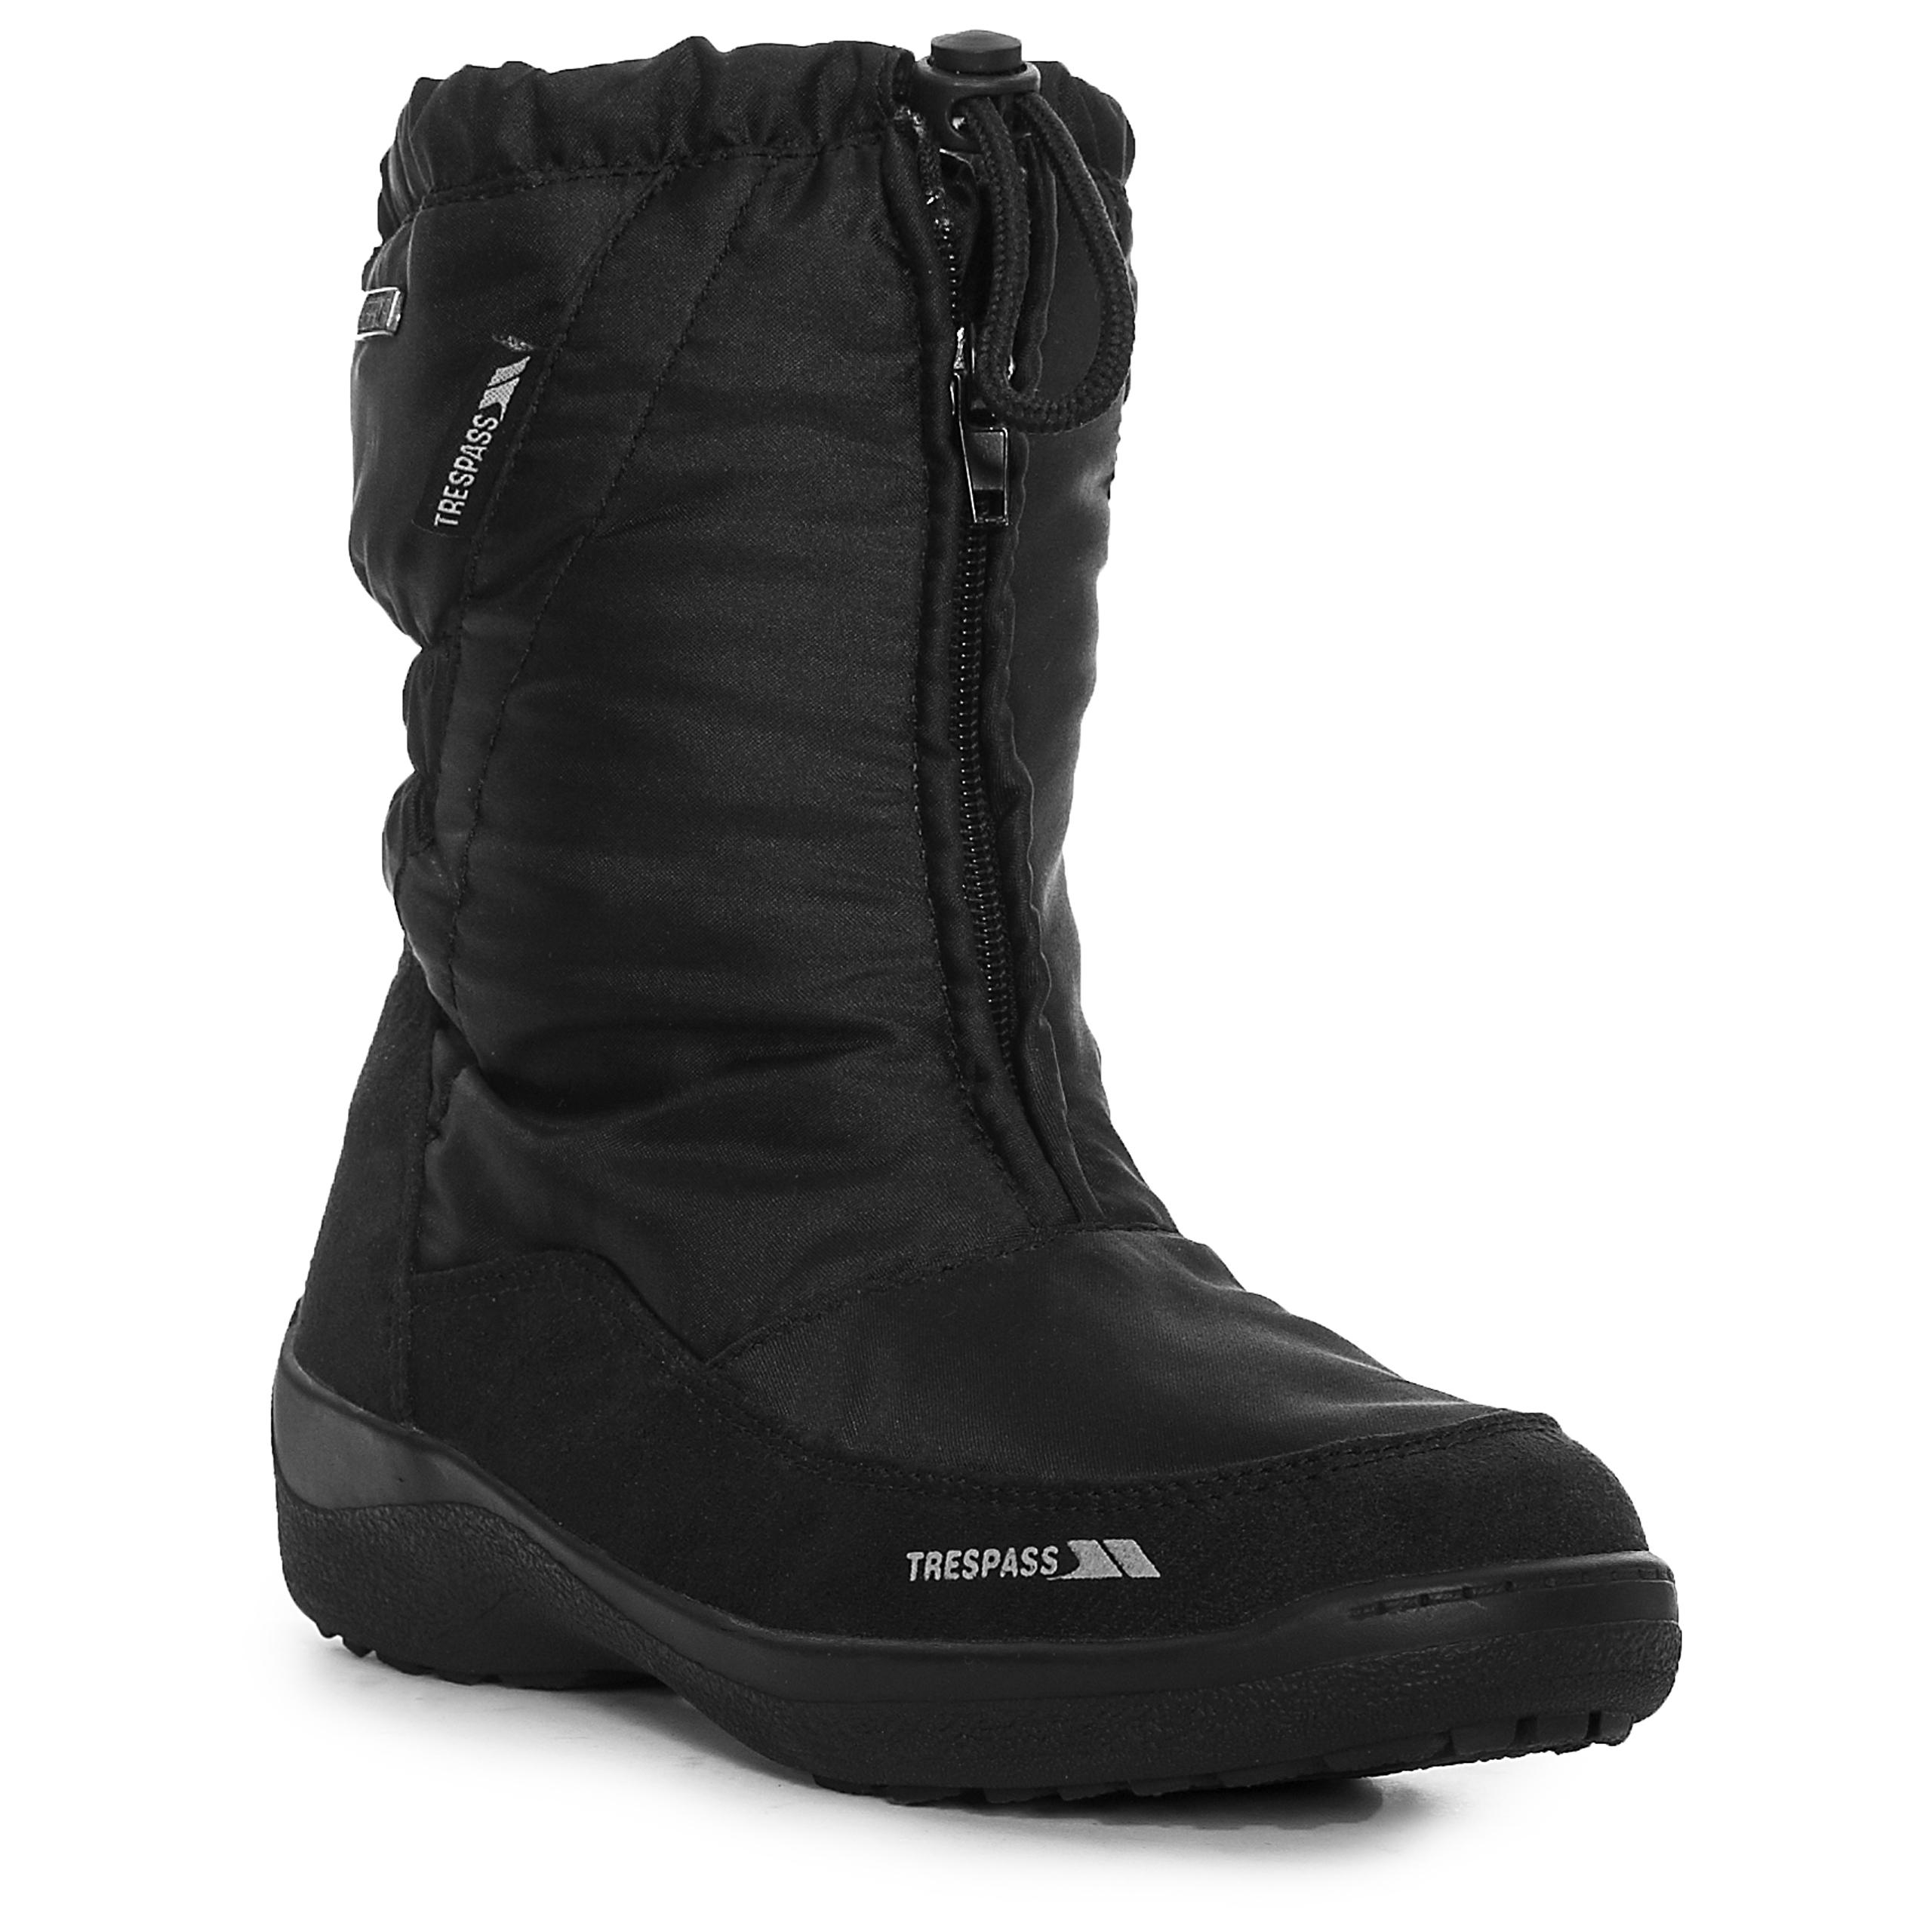 Model  Womens Black Waterproof Insulated Zip Up Winter Snow Boots  EBay